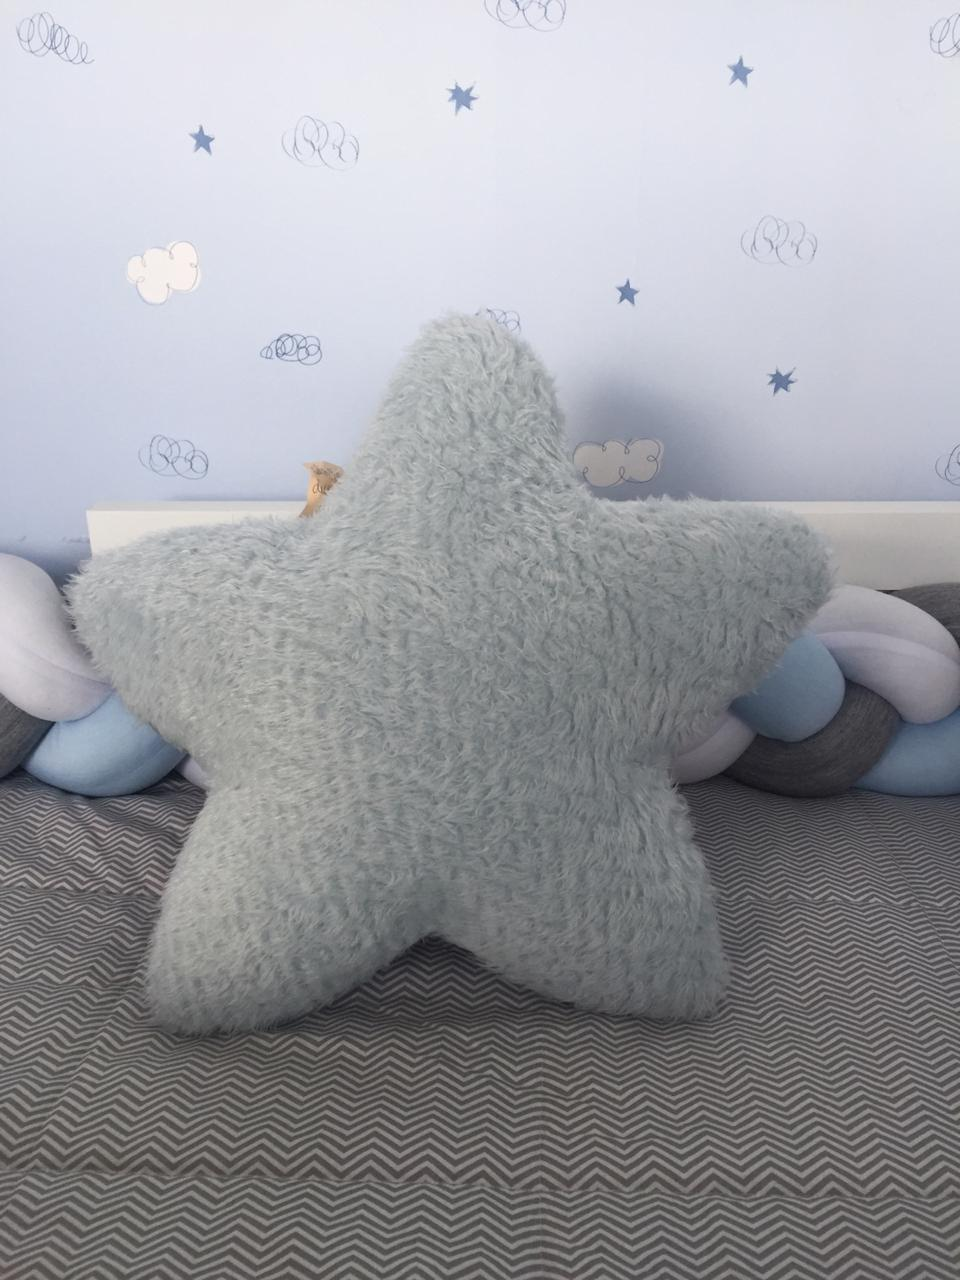 Almofada Decorativa Estrela